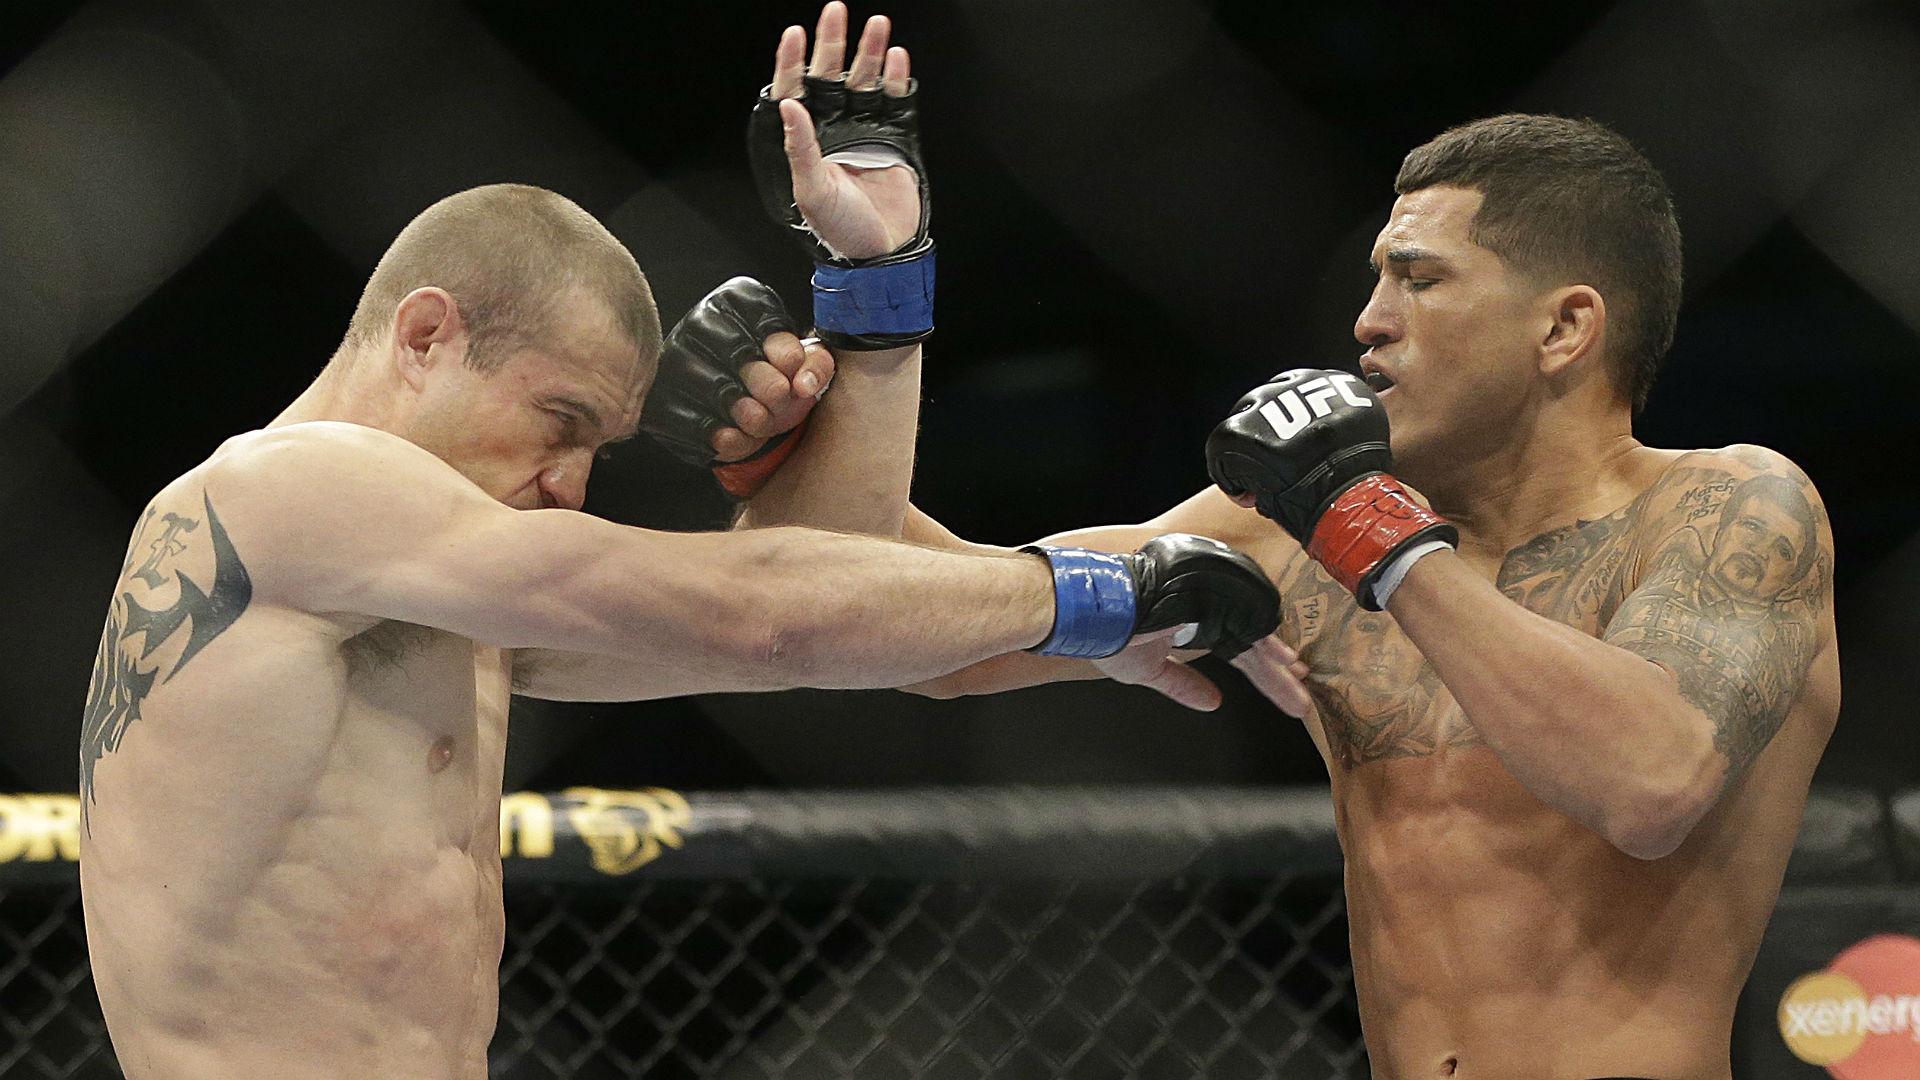 UFC 181 odds and picks – Pettis, Melendez face off on Vegas undercard